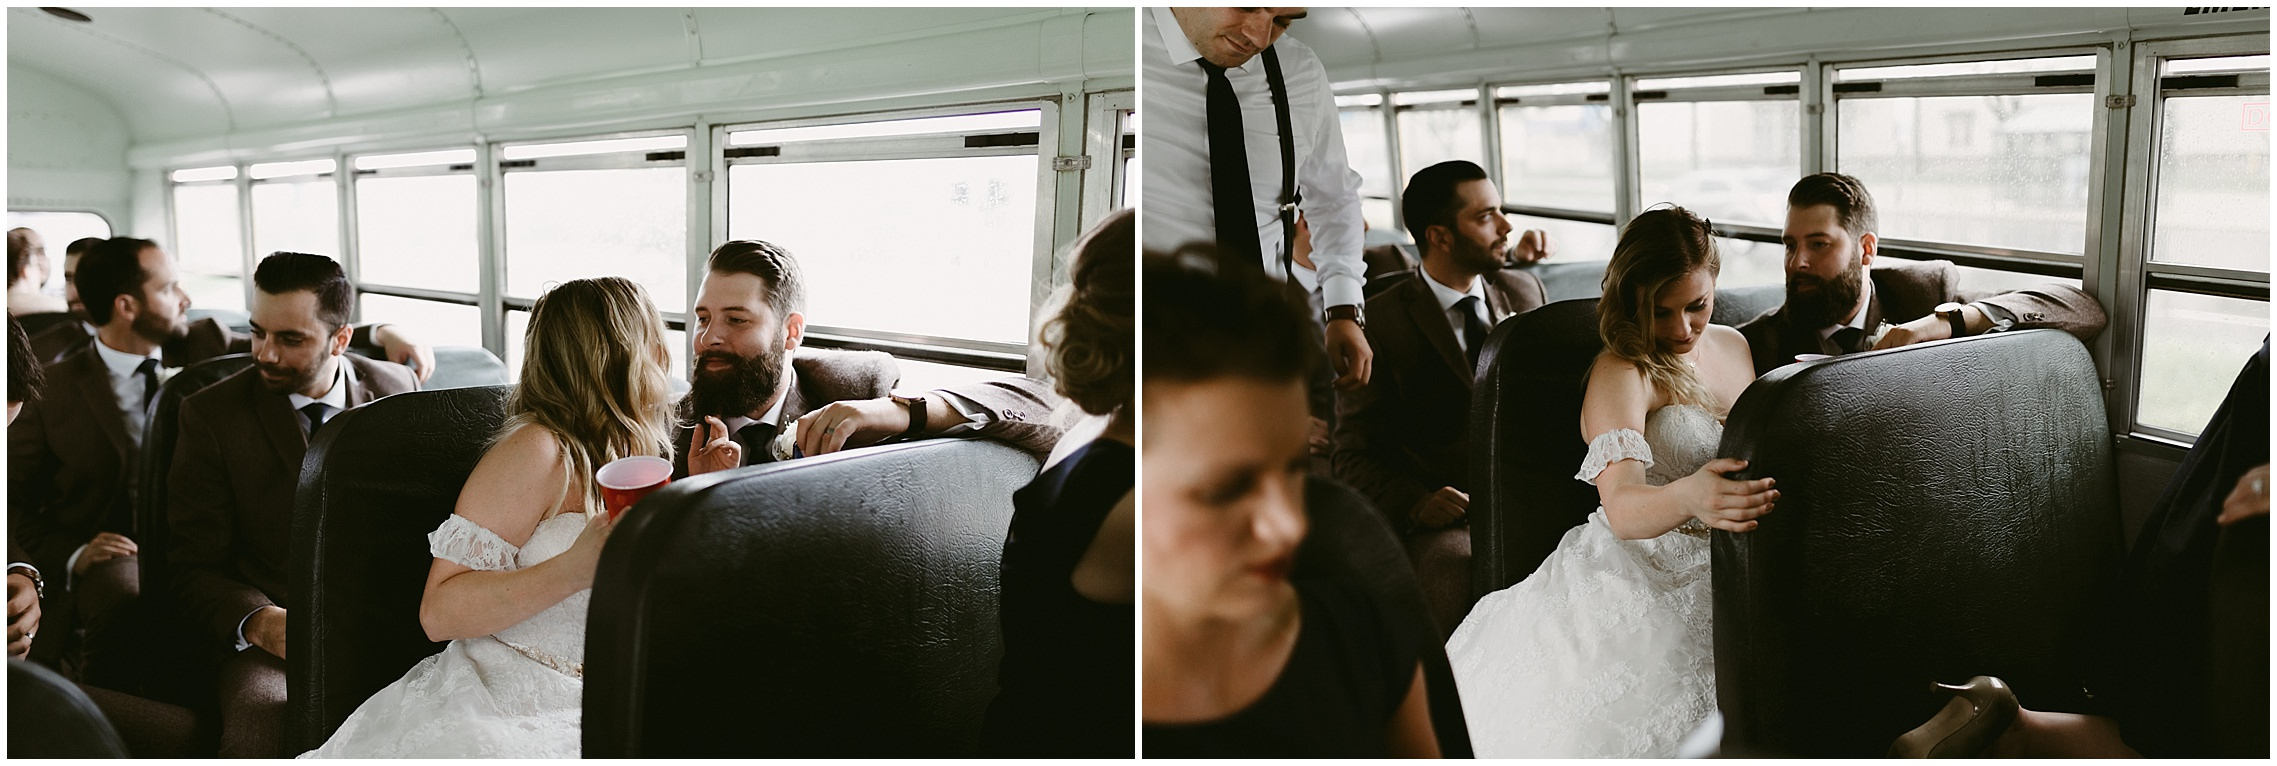 brick_and_mortar_colorado_wedding_photographer_0244.jpg